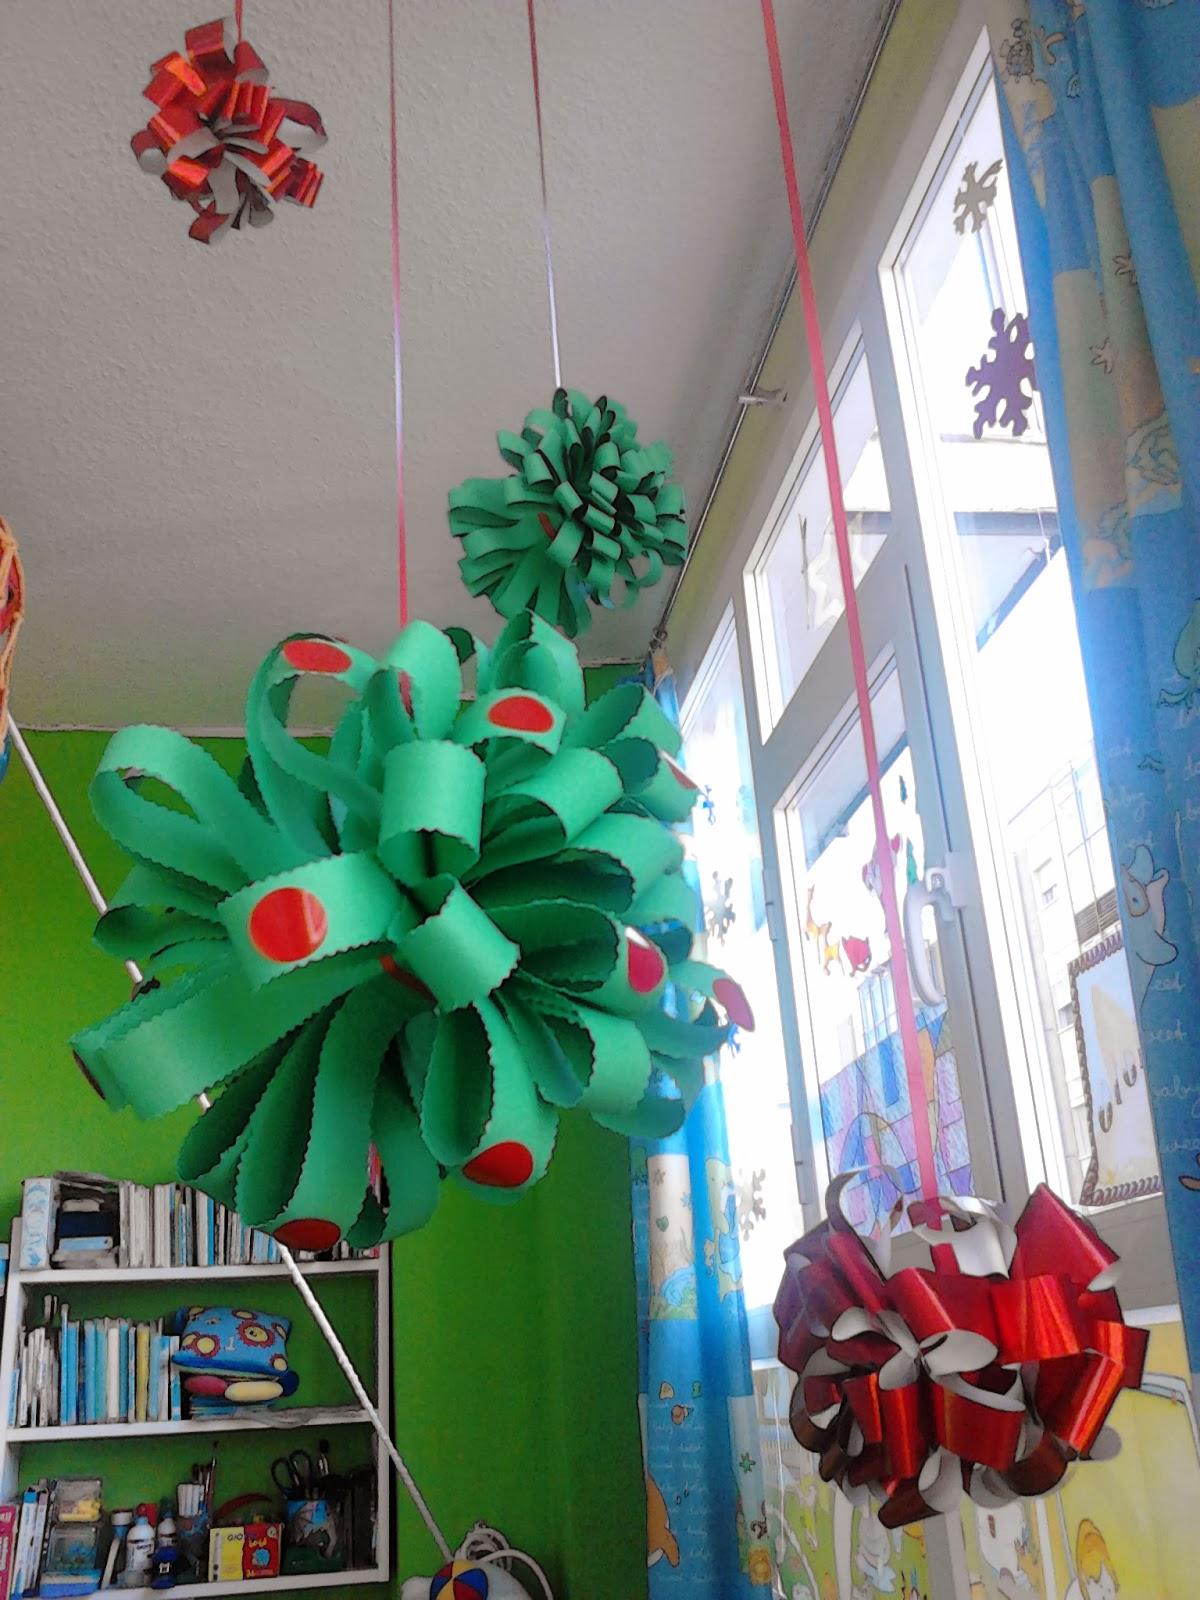 Escuela infantil pis pas decoraci n navide a for Decoracion de interiores de la escuela